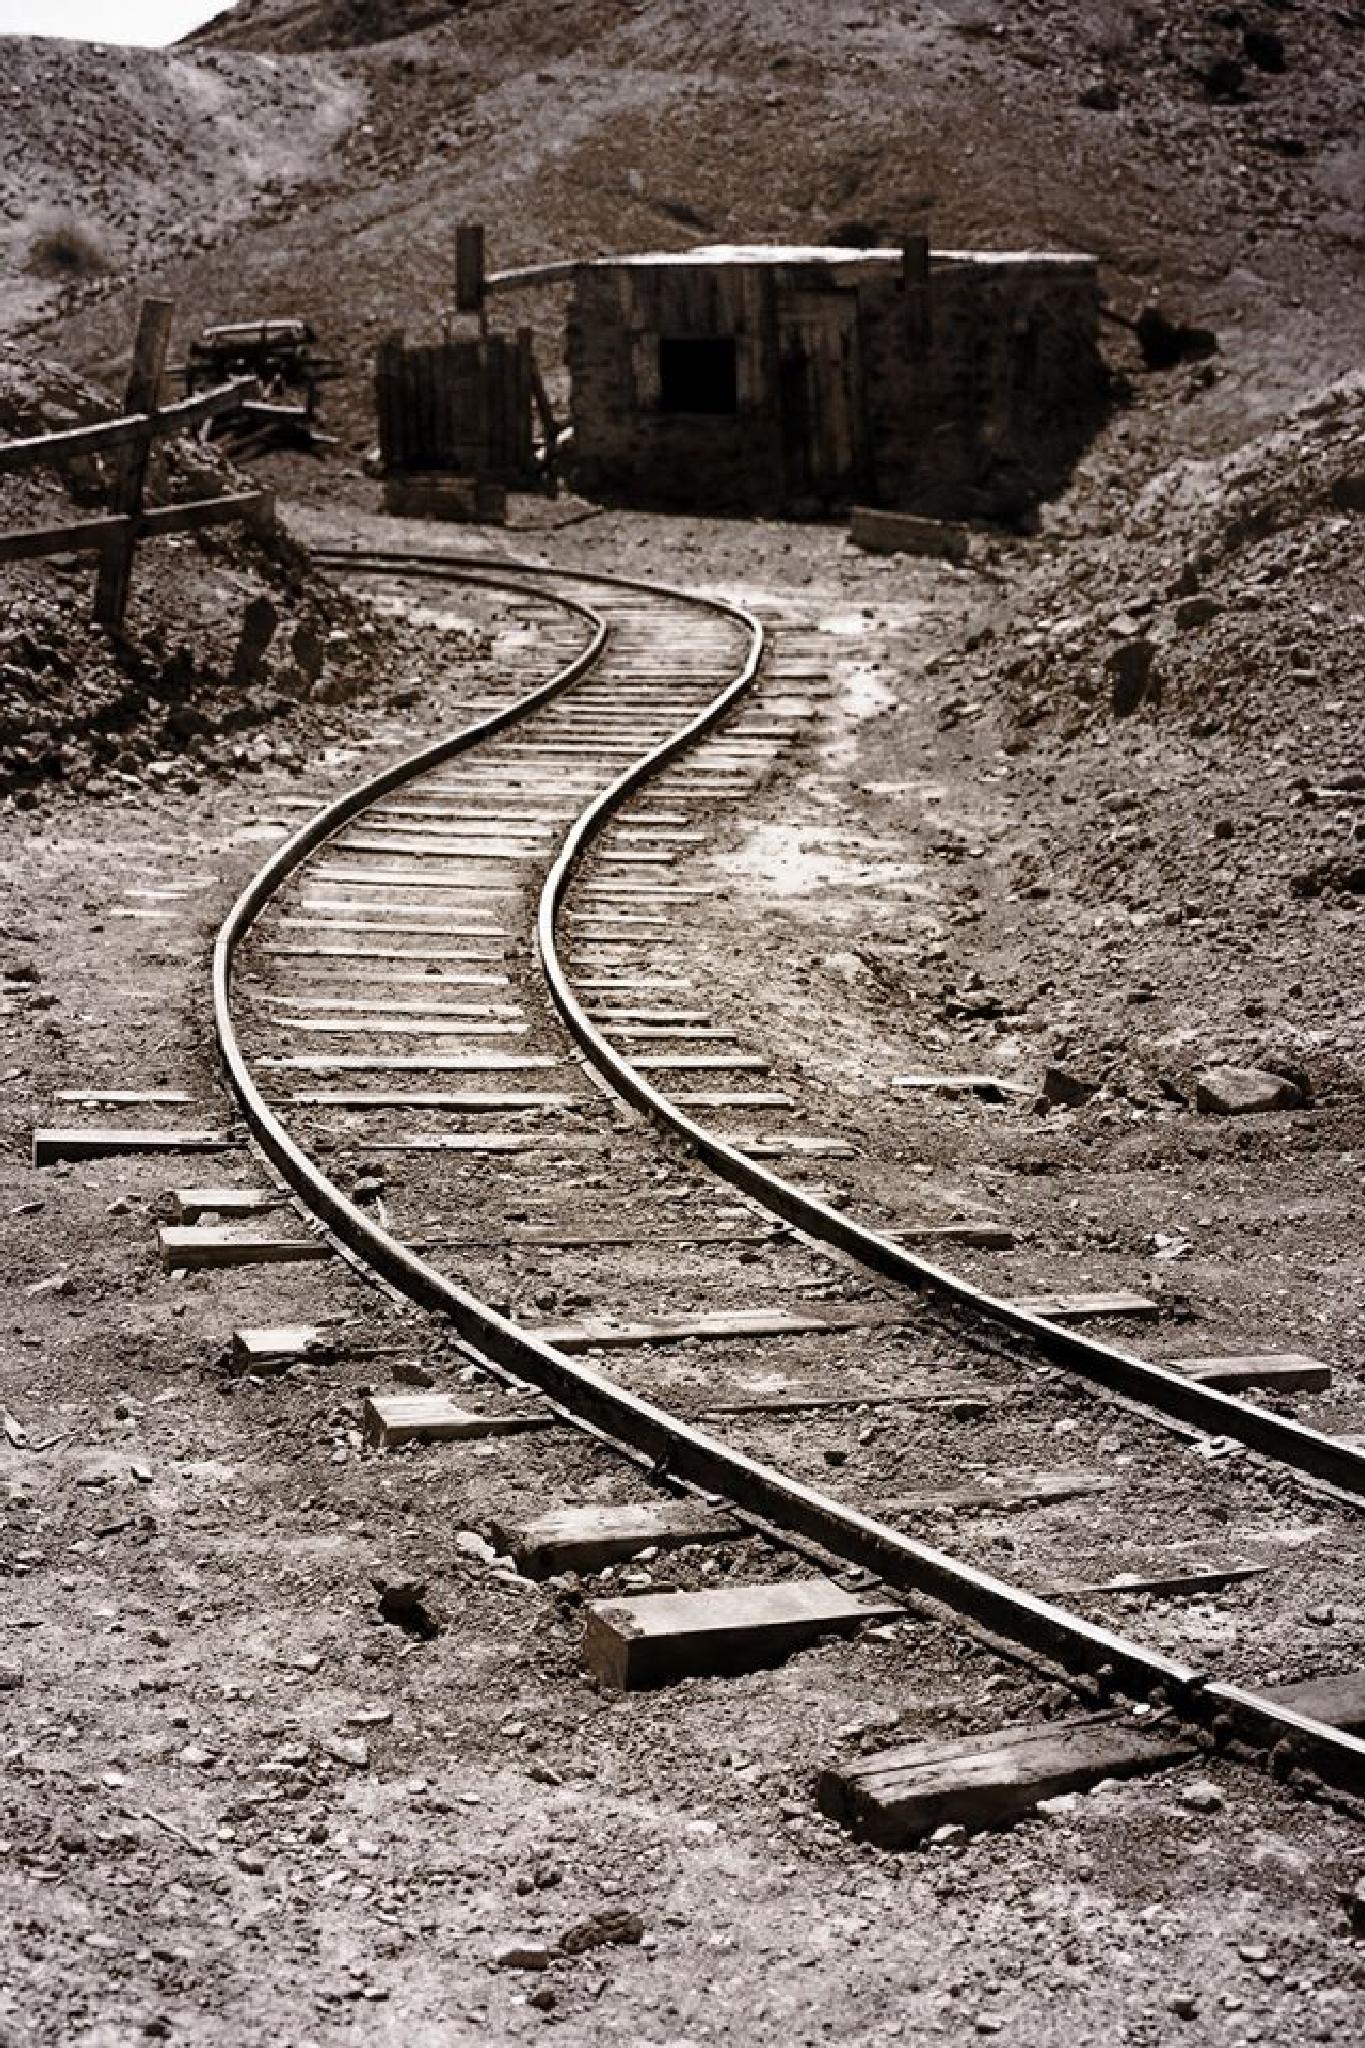 Winding rail by dennis.glisson